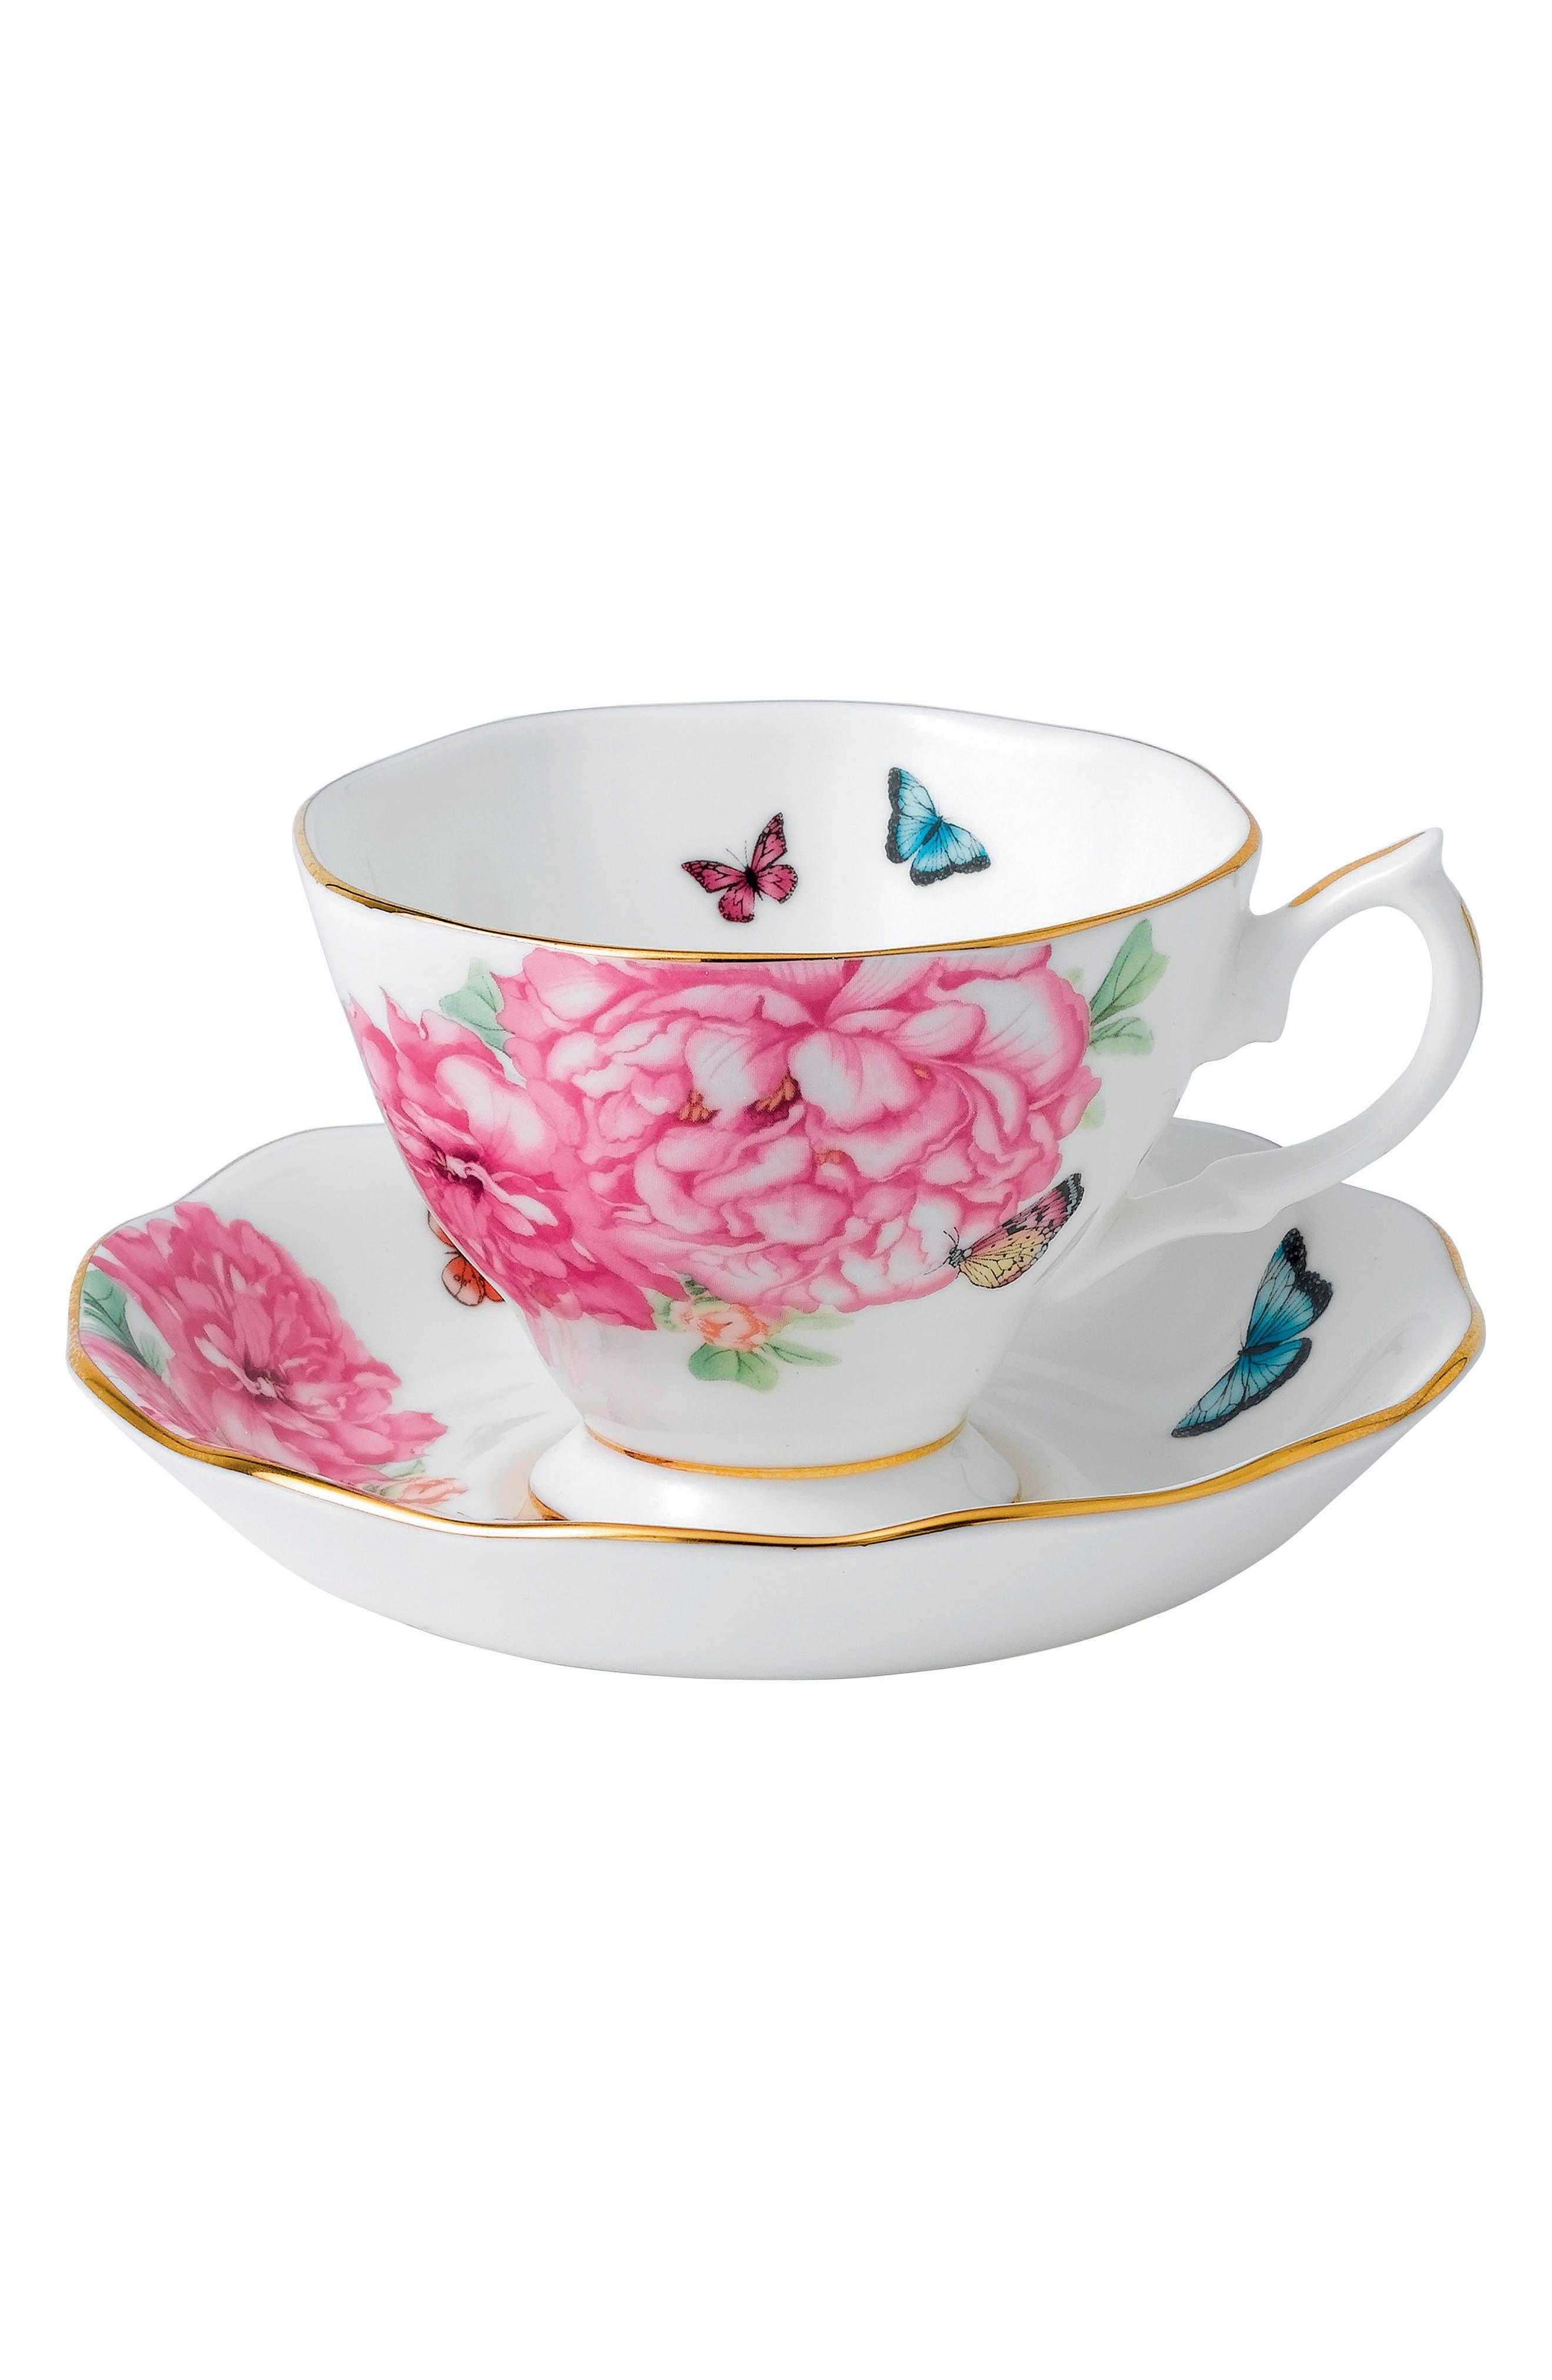 Friendship Teacup & Saucer,                         Main,                         color,